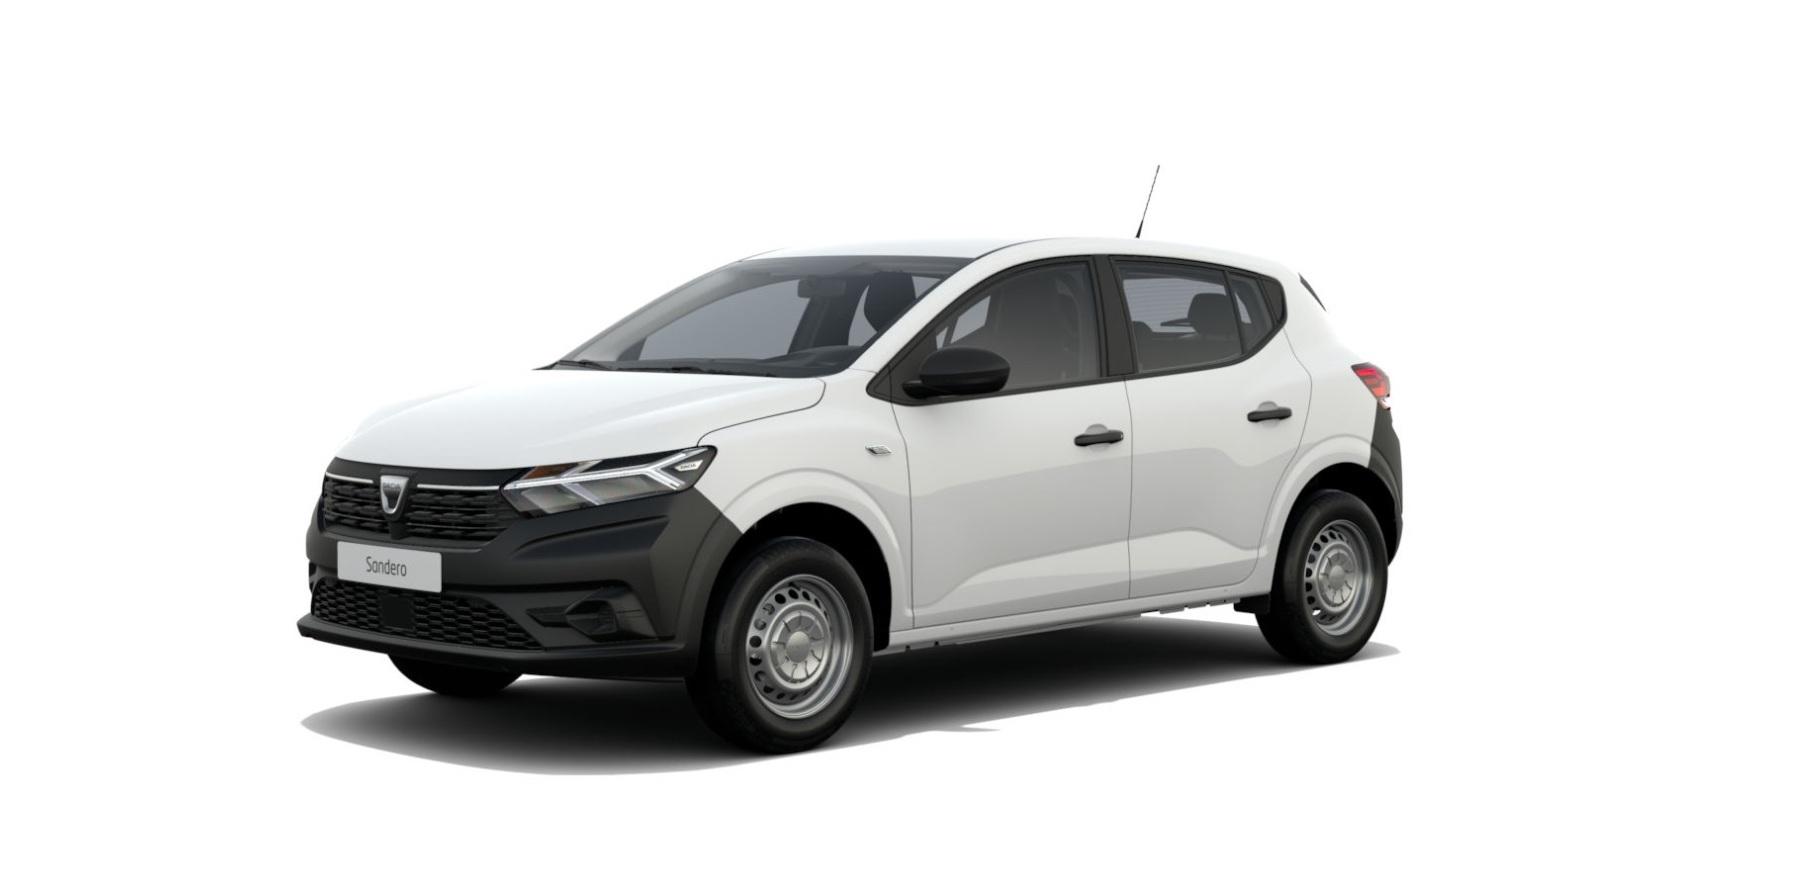 Dacia Sandero Access 01